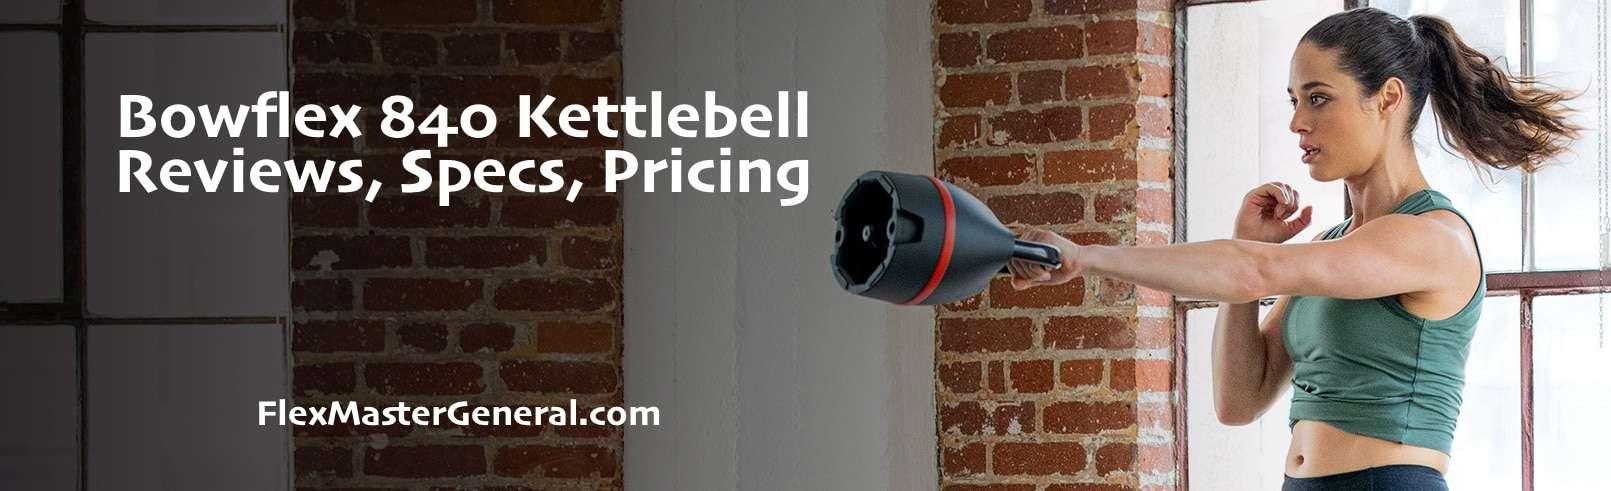 FlexMasterGeneral reviews the new Bowflex 840 adjustable kettlebells